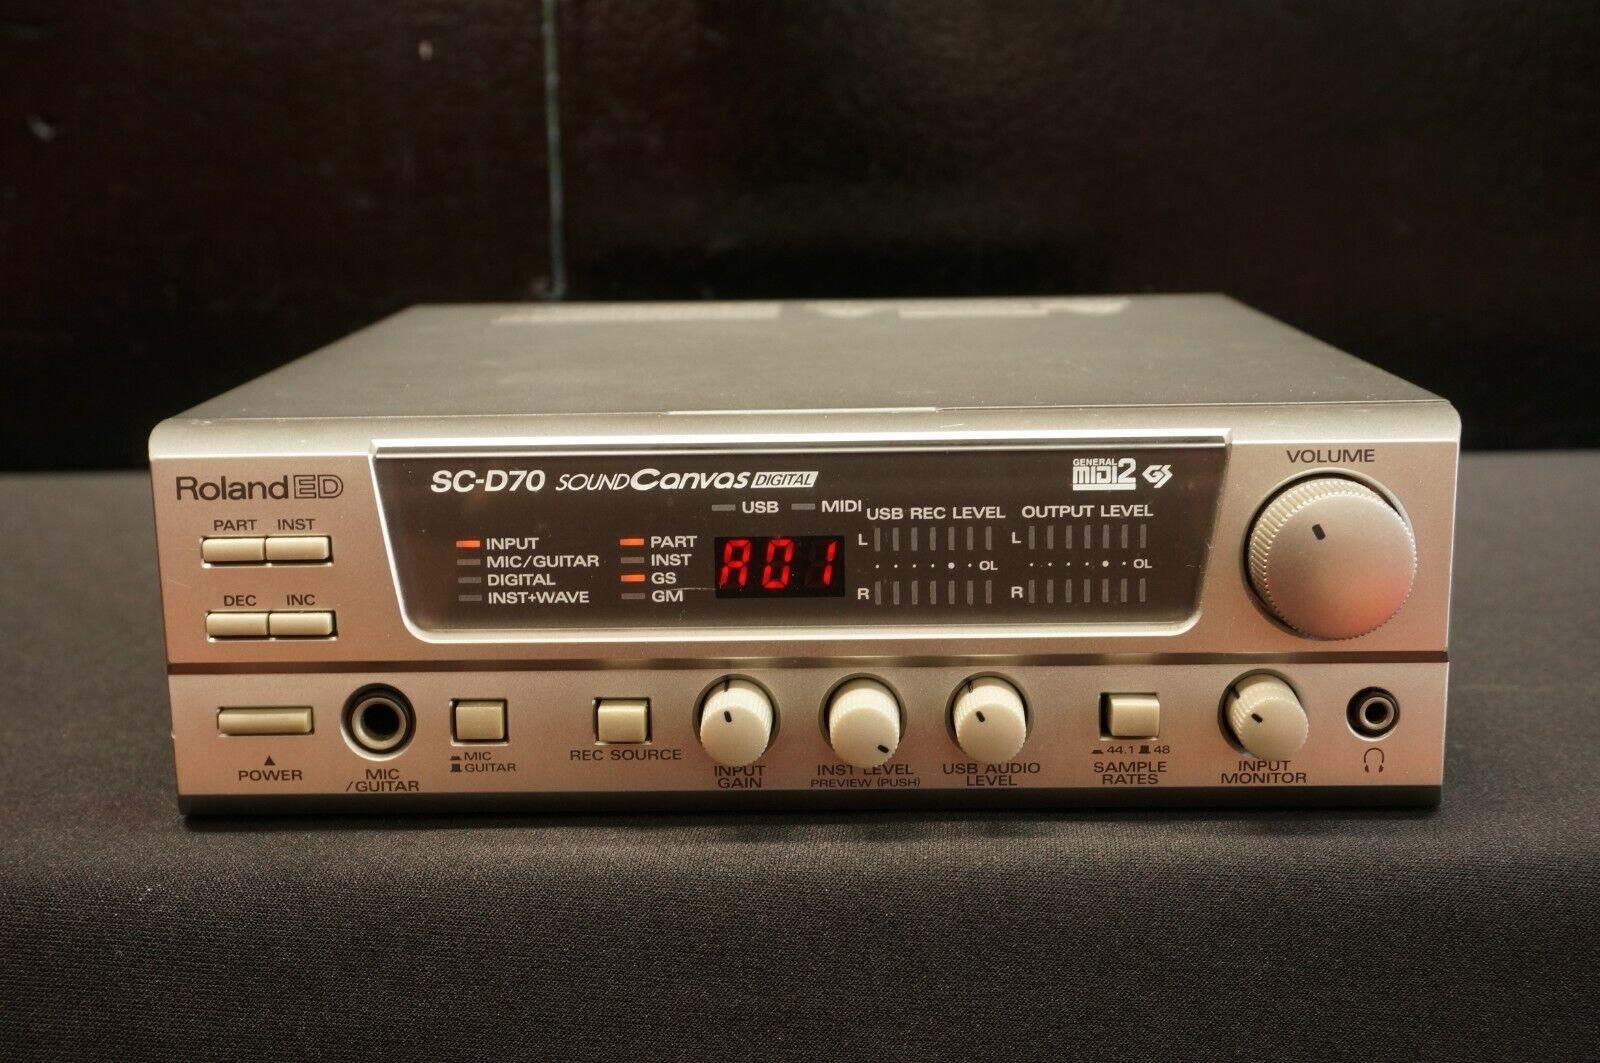 Roland ED SC-D70 Sound Canvas Polyphonic Digital Module MIDI USB - 100V